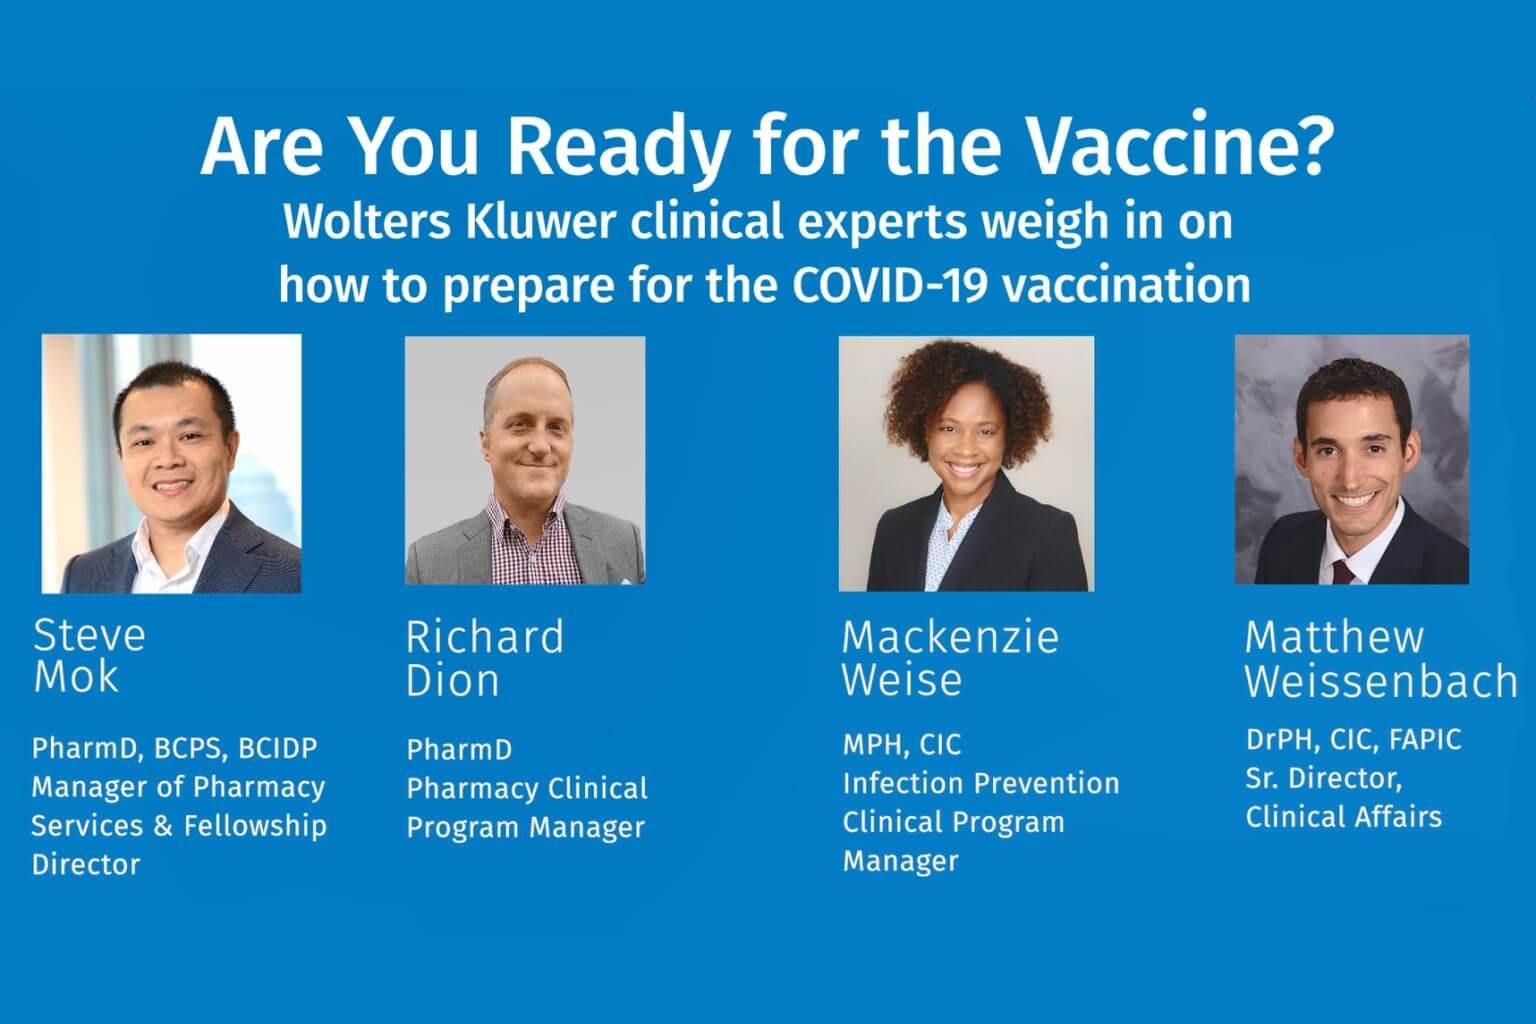 Discussing COVID-19 vaccine